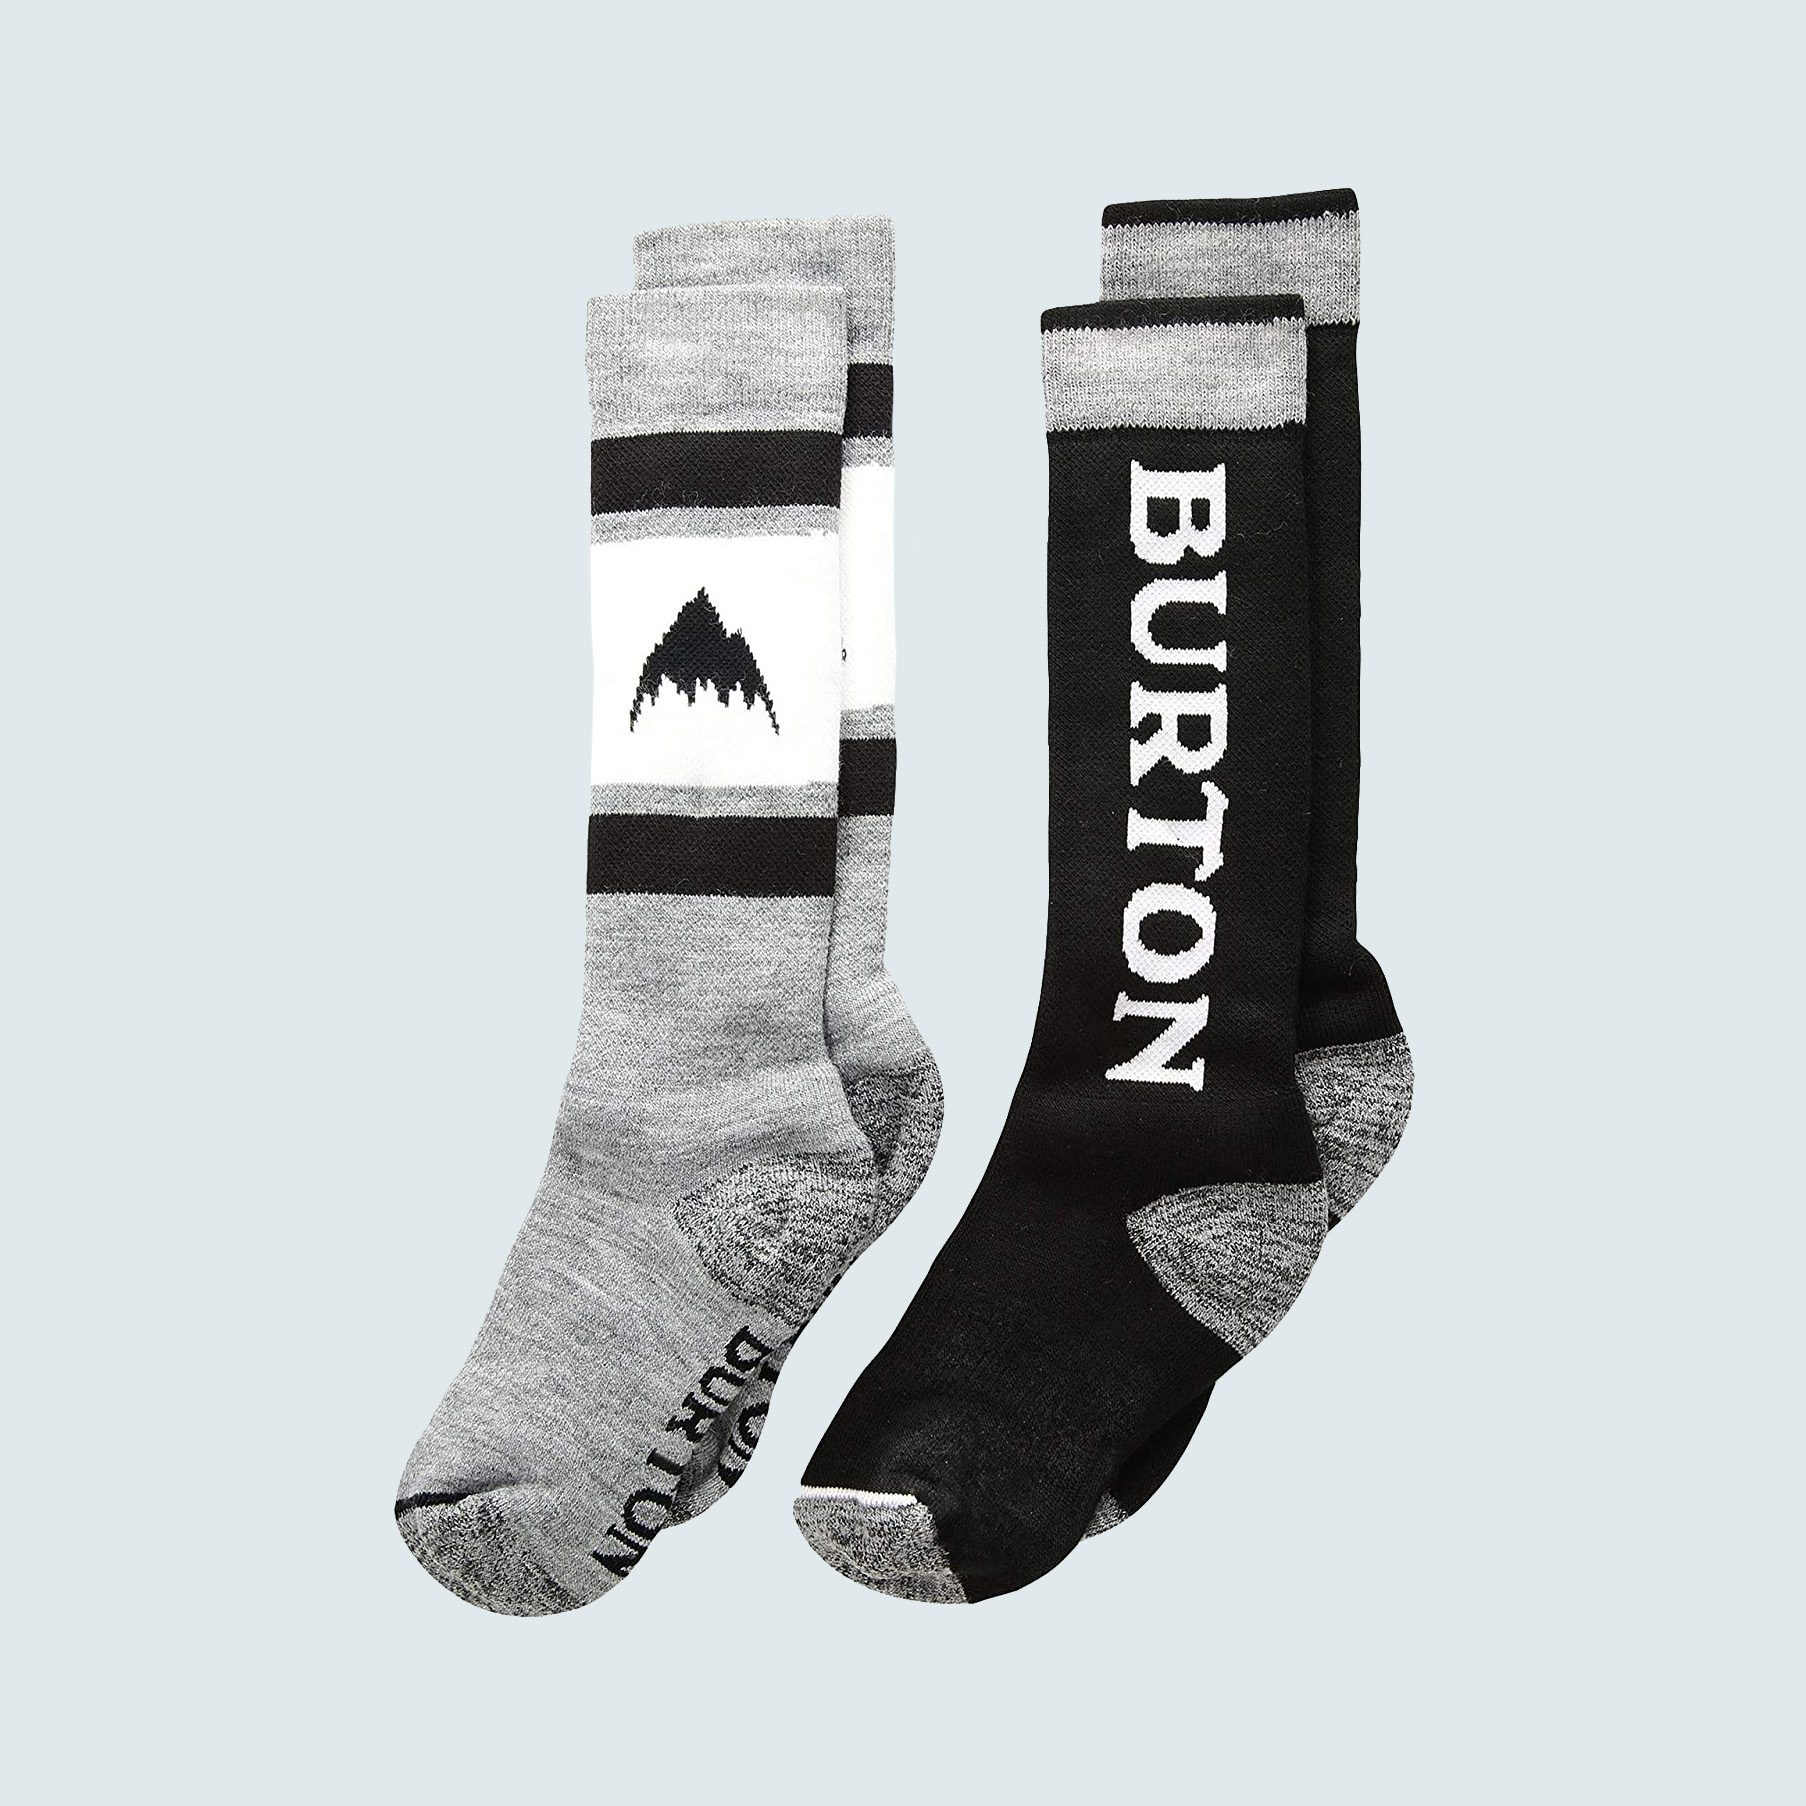 warm socks for kids